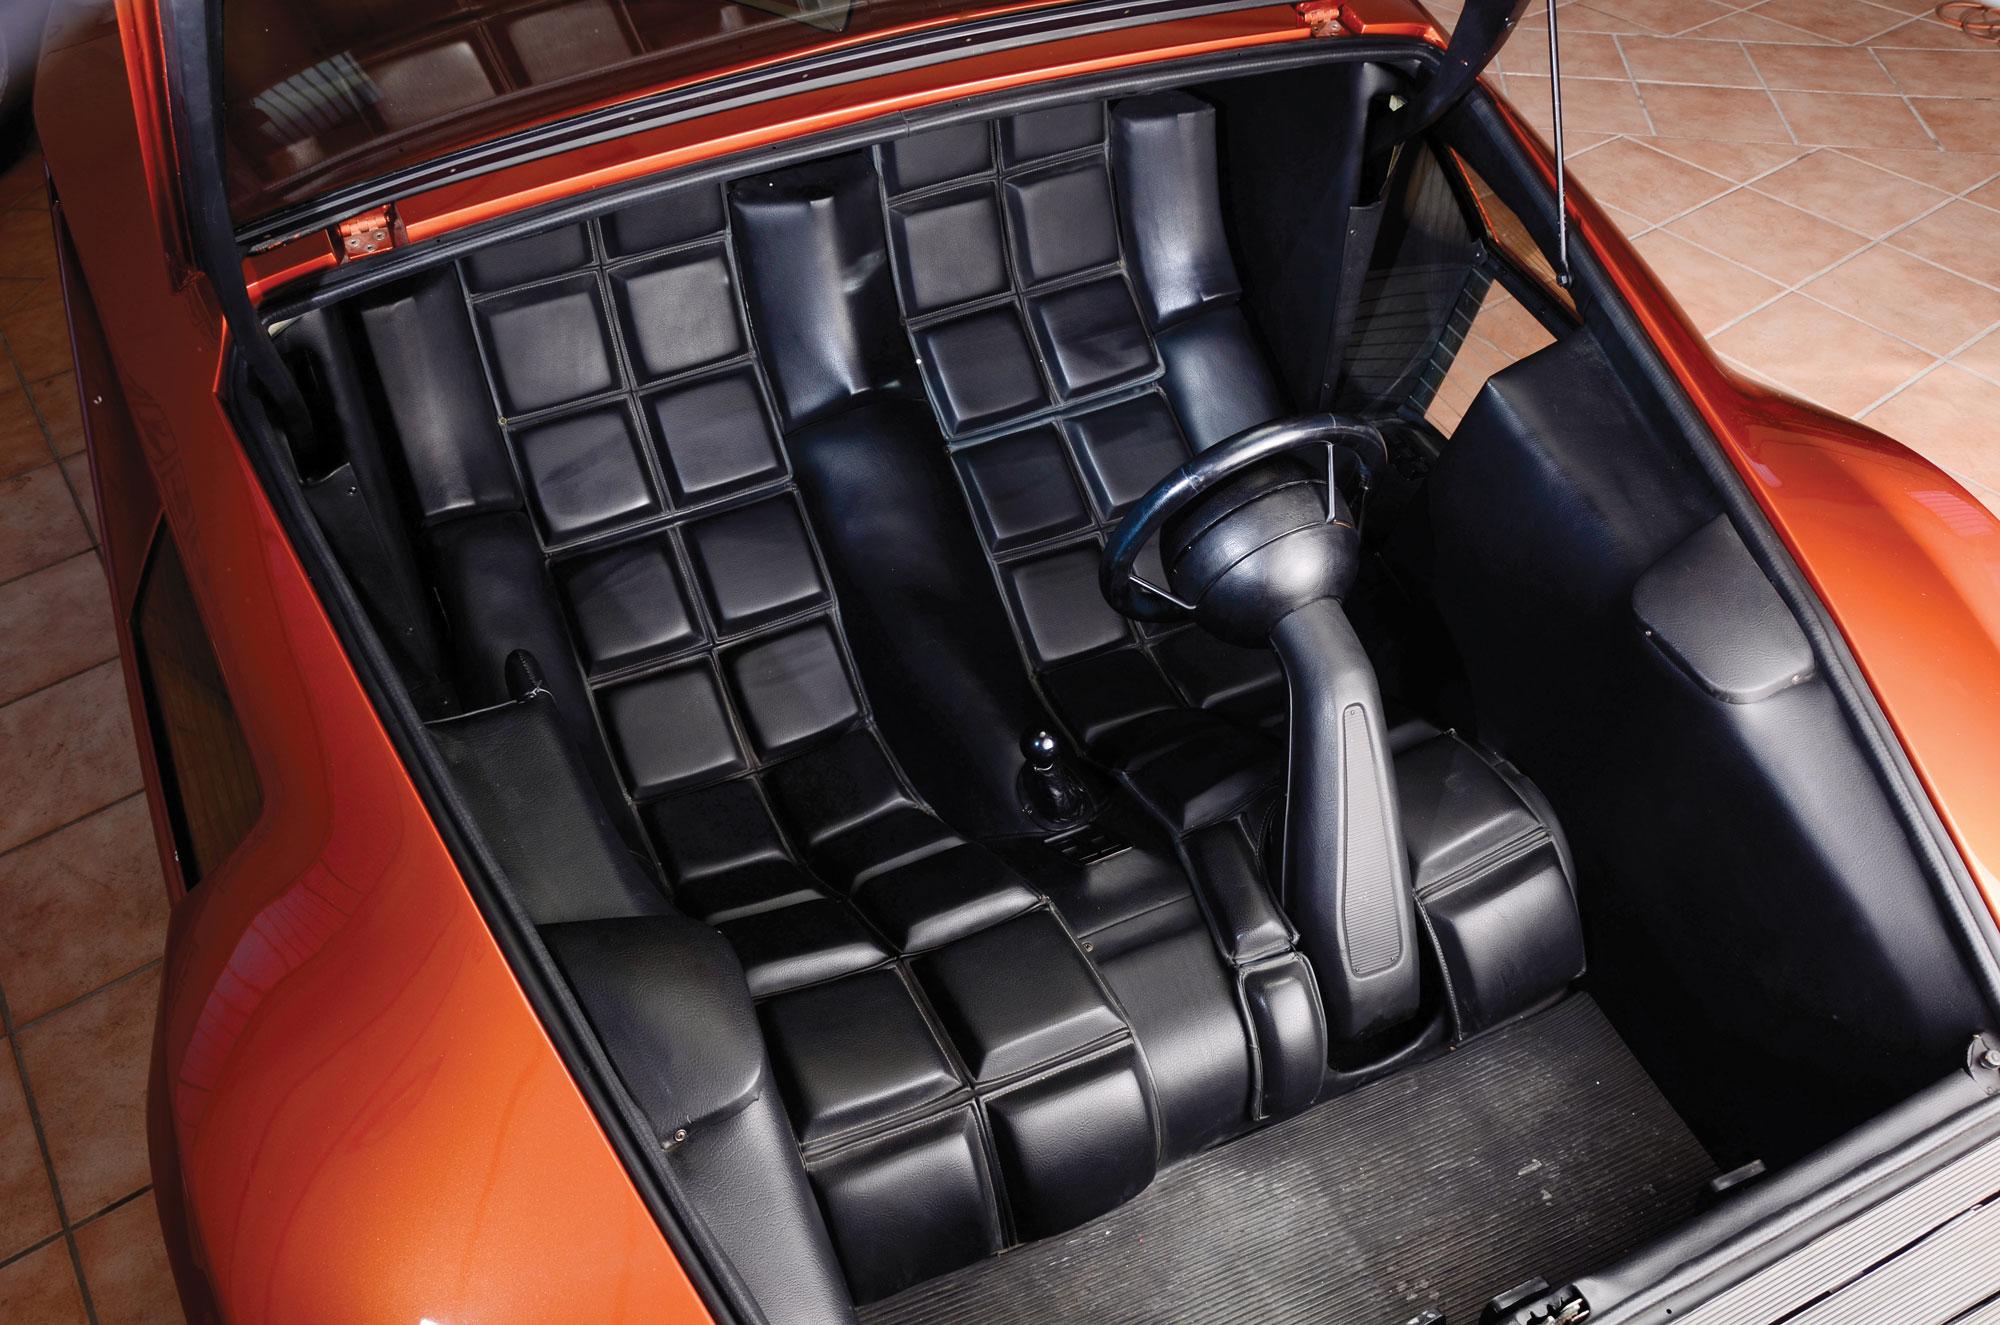 1970 Lancia Stratos HF Zero interior